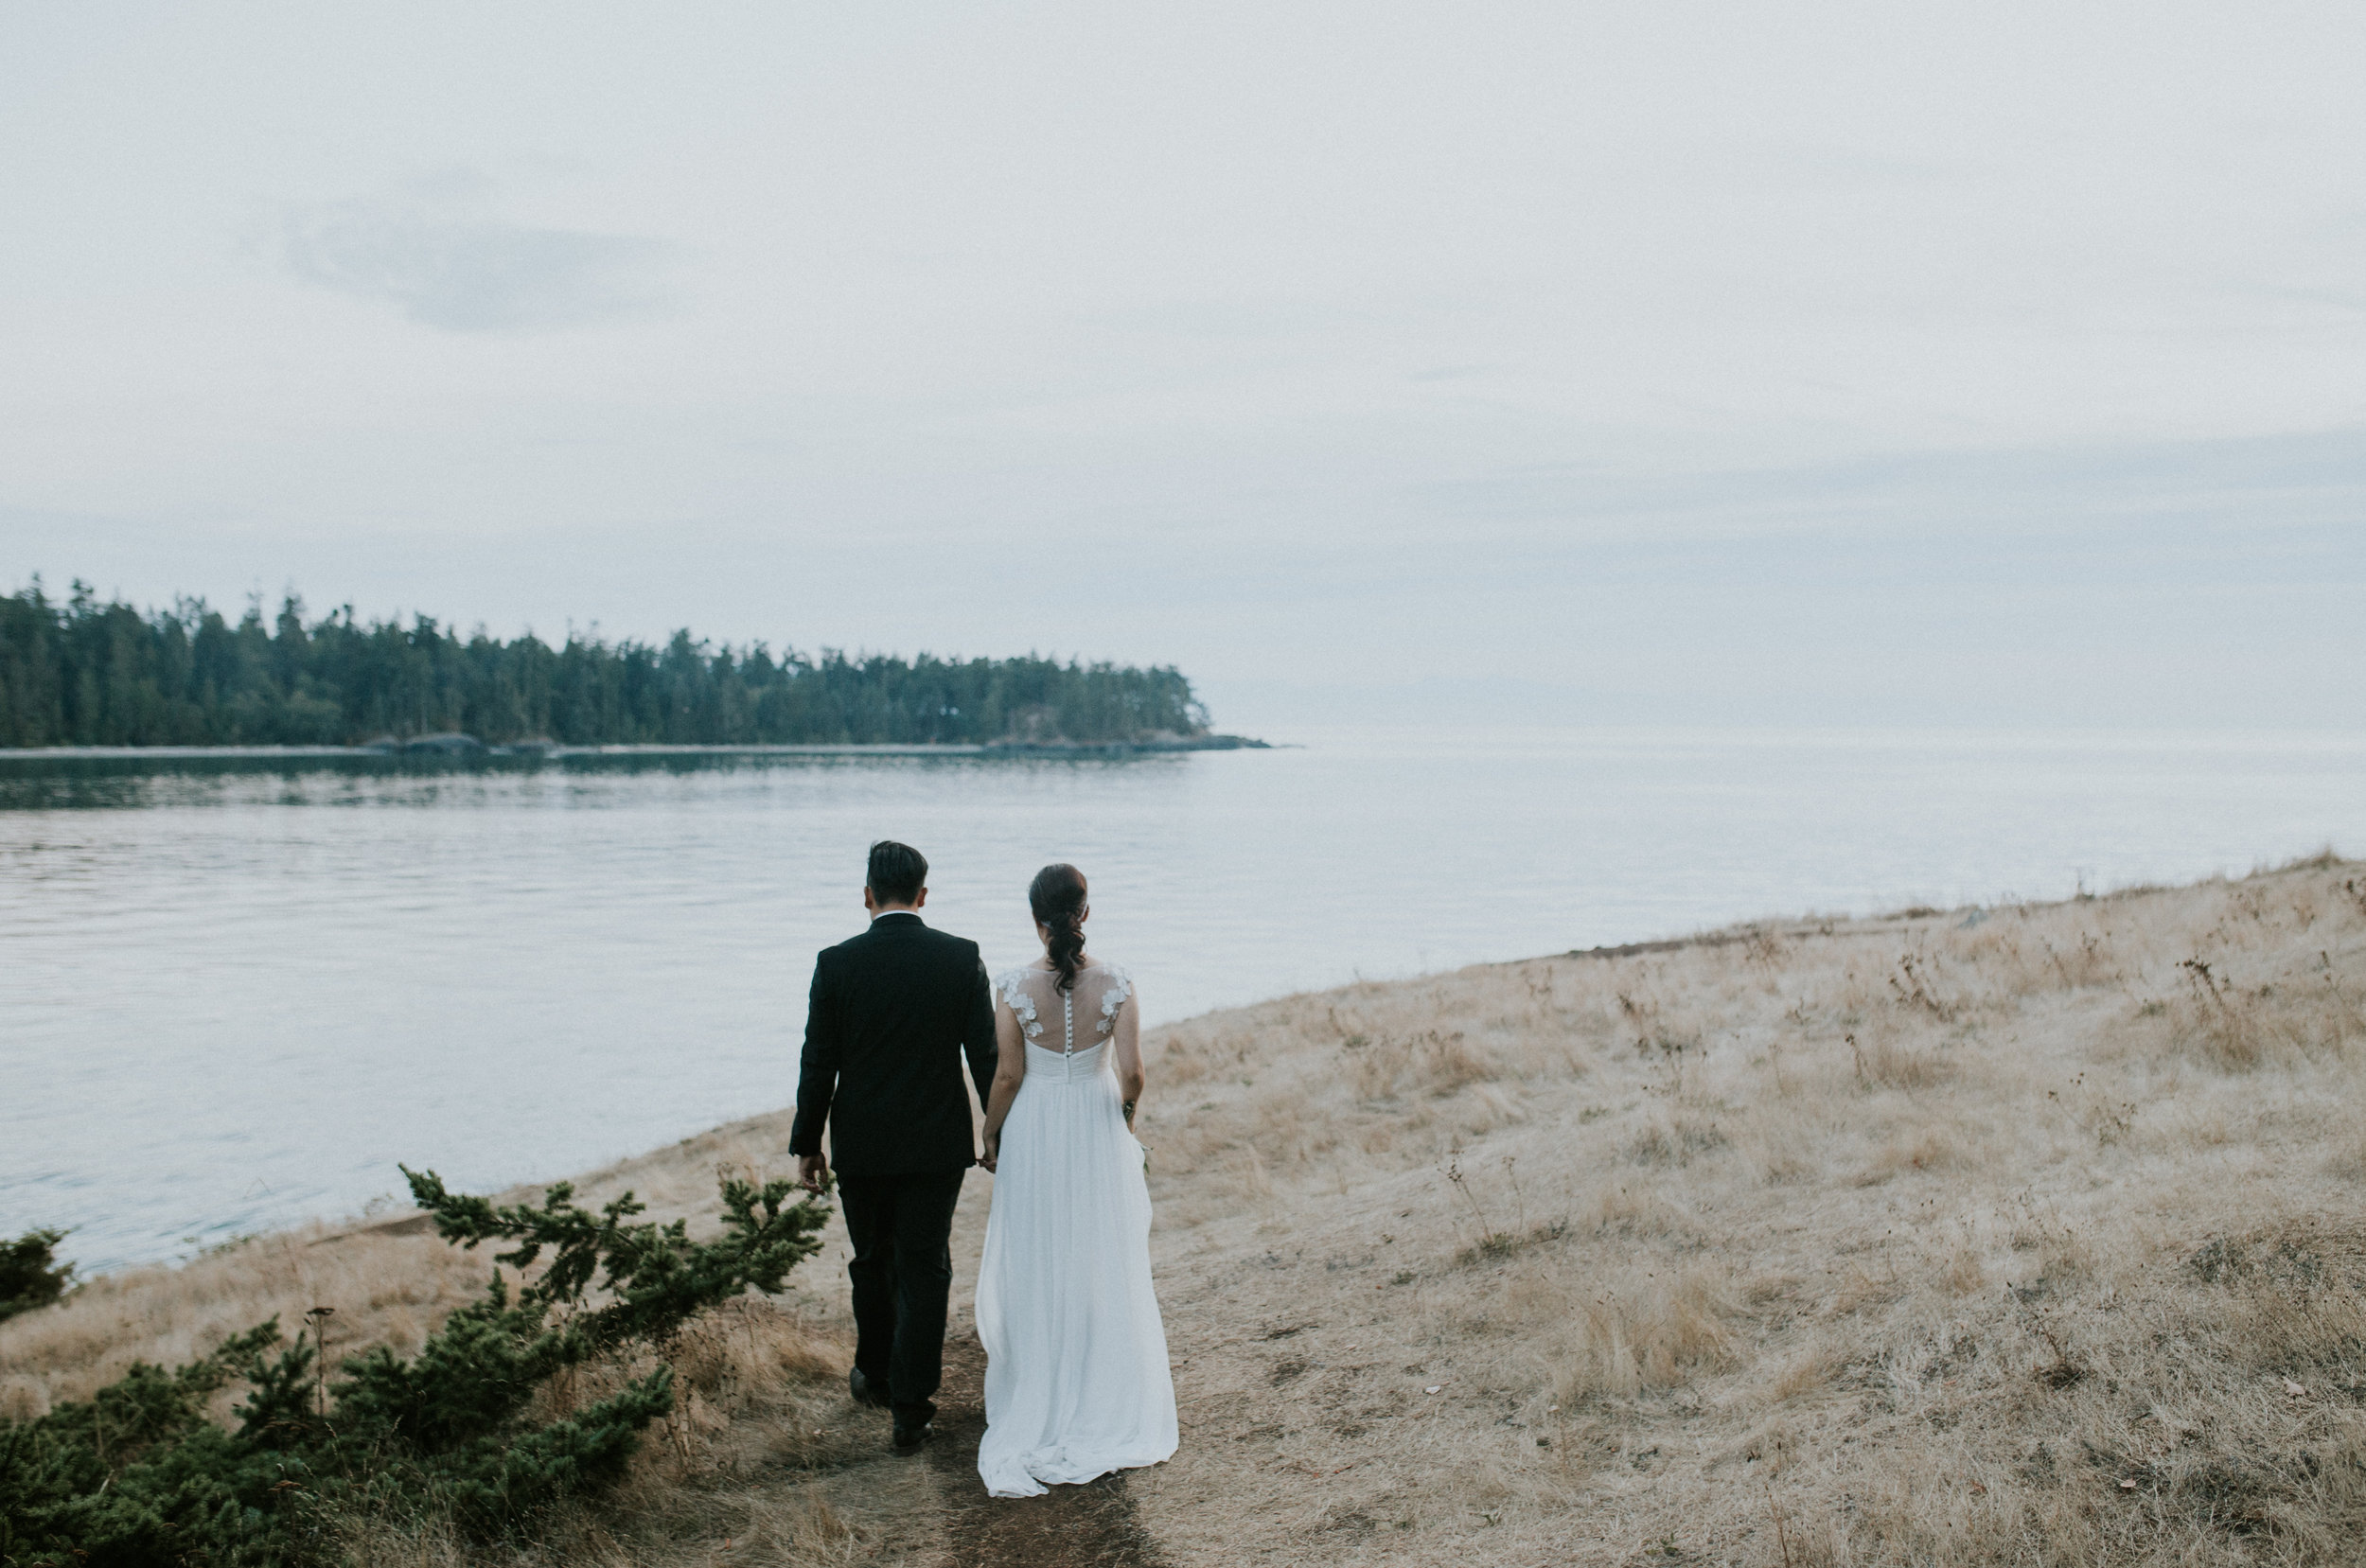 sunset wedding photographer seattle